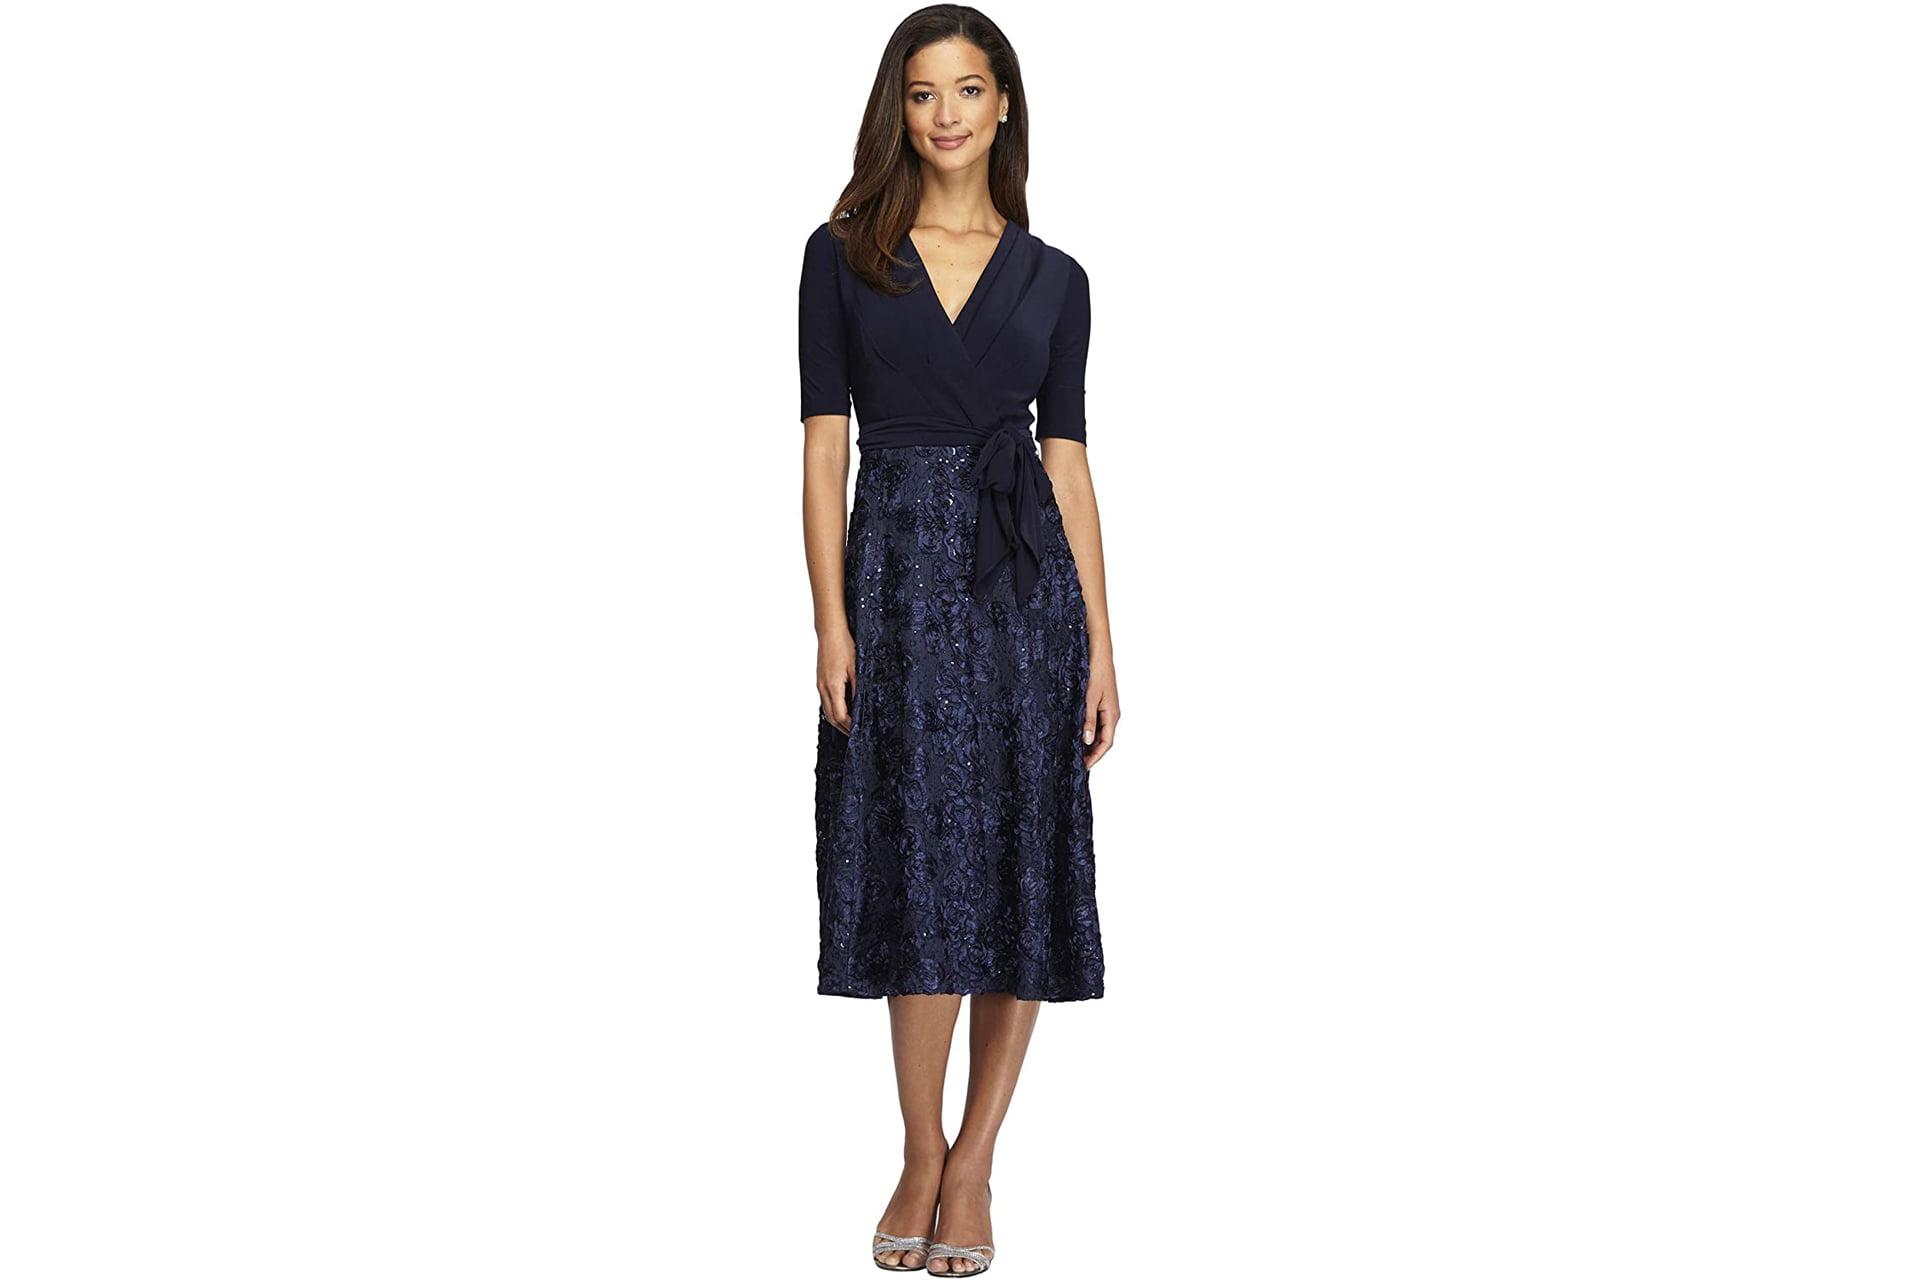 Mother of the groom dress idea: Alex Evenings Tea Length Dress with Rosette Detail